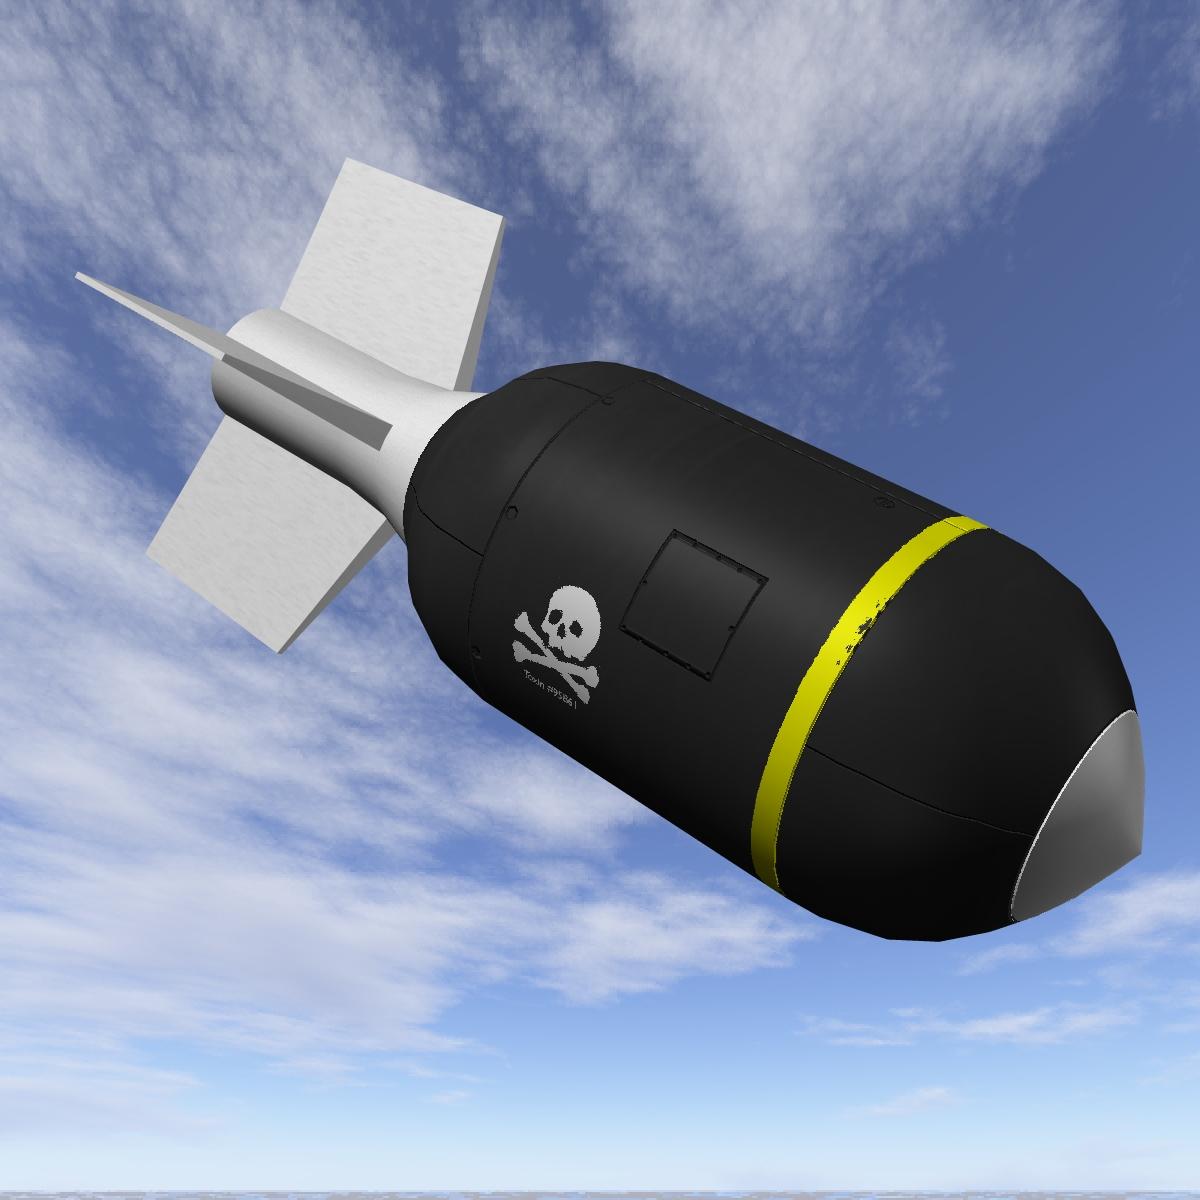 Bomb, Jolly Roger scheme 3d model 3ds dxf fbx blend cob dae X obj 162666